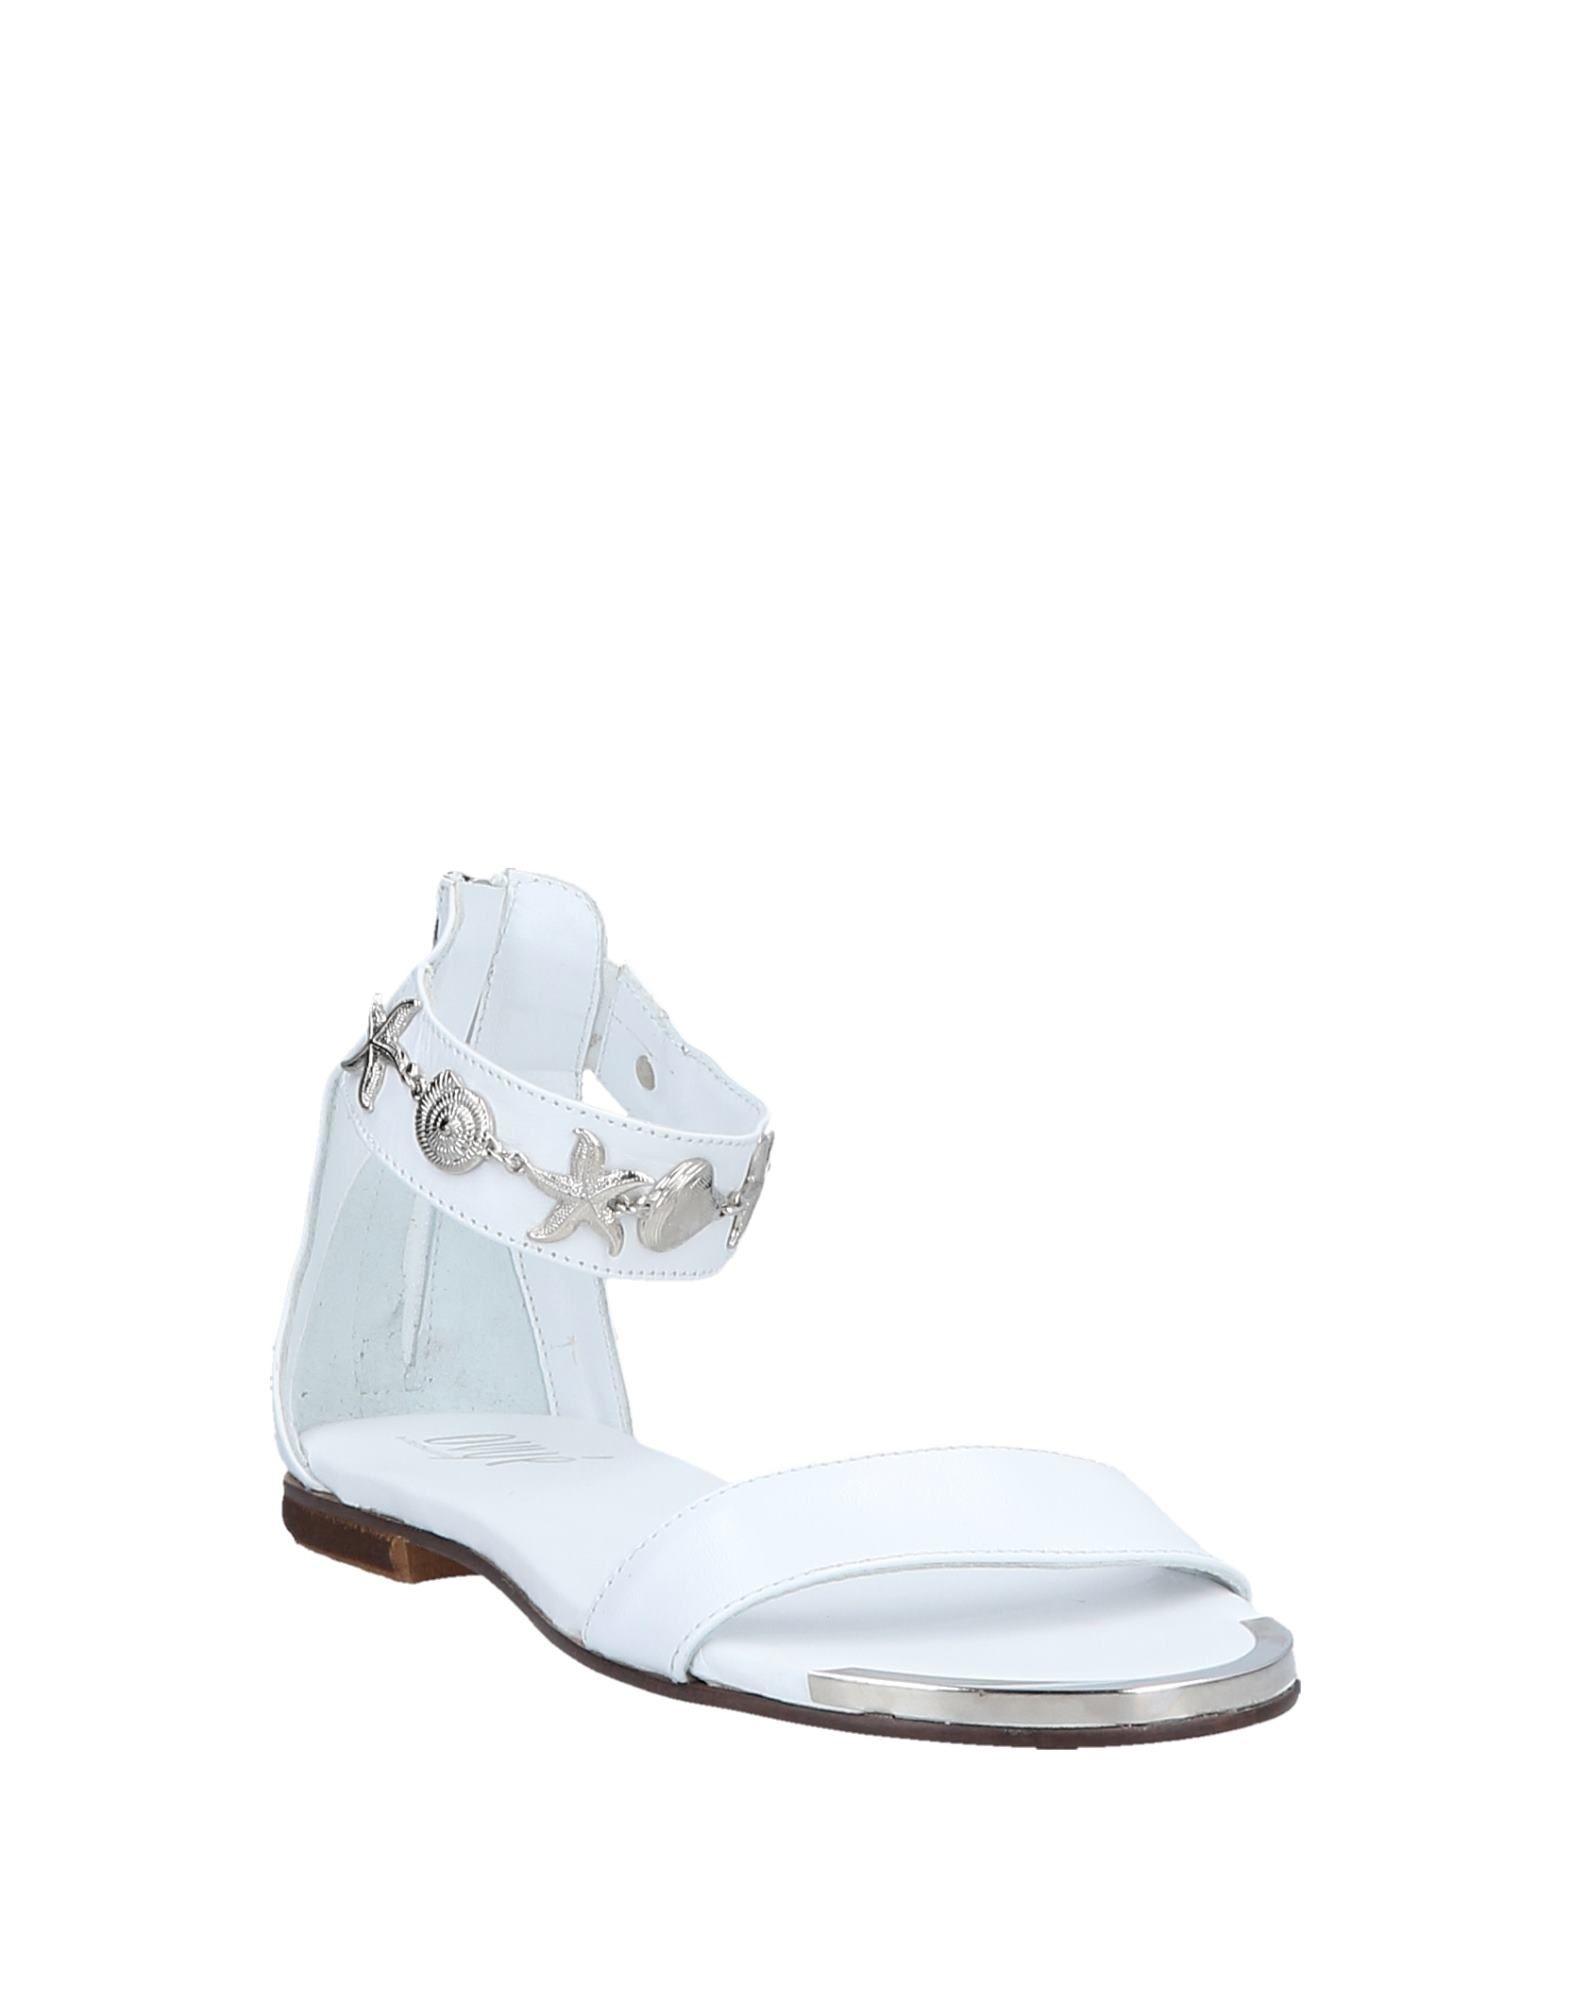 ovye & # # # 39; par cristina lucchi sandales - femmes ovye & # 39; par cristina lucchi sandales en ligne sur canada - 11564906qc fcbff3